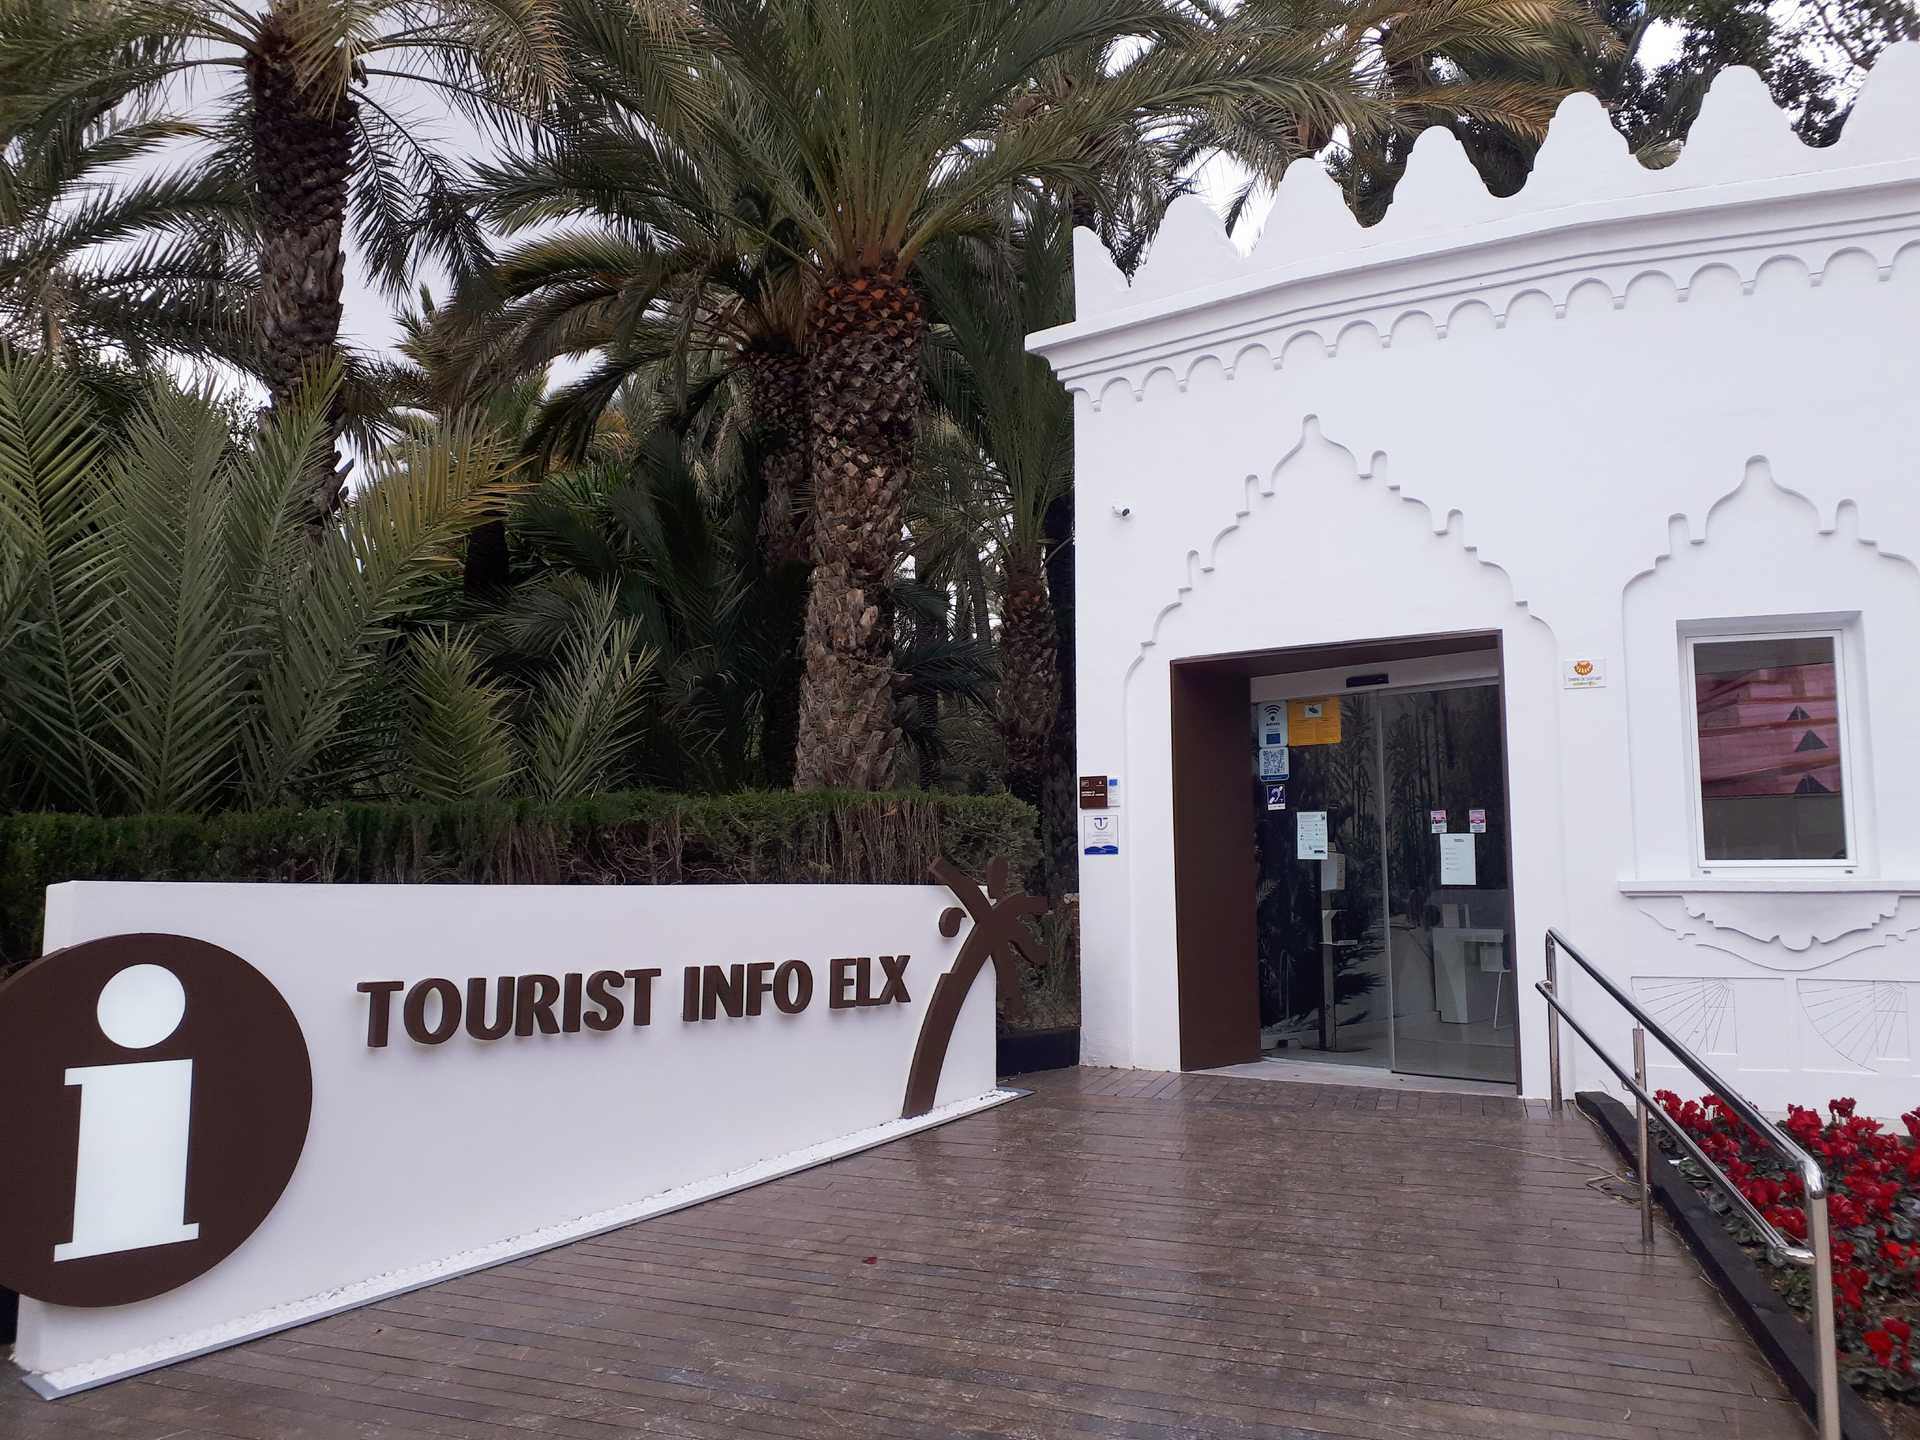 TOURIST INFO ELX